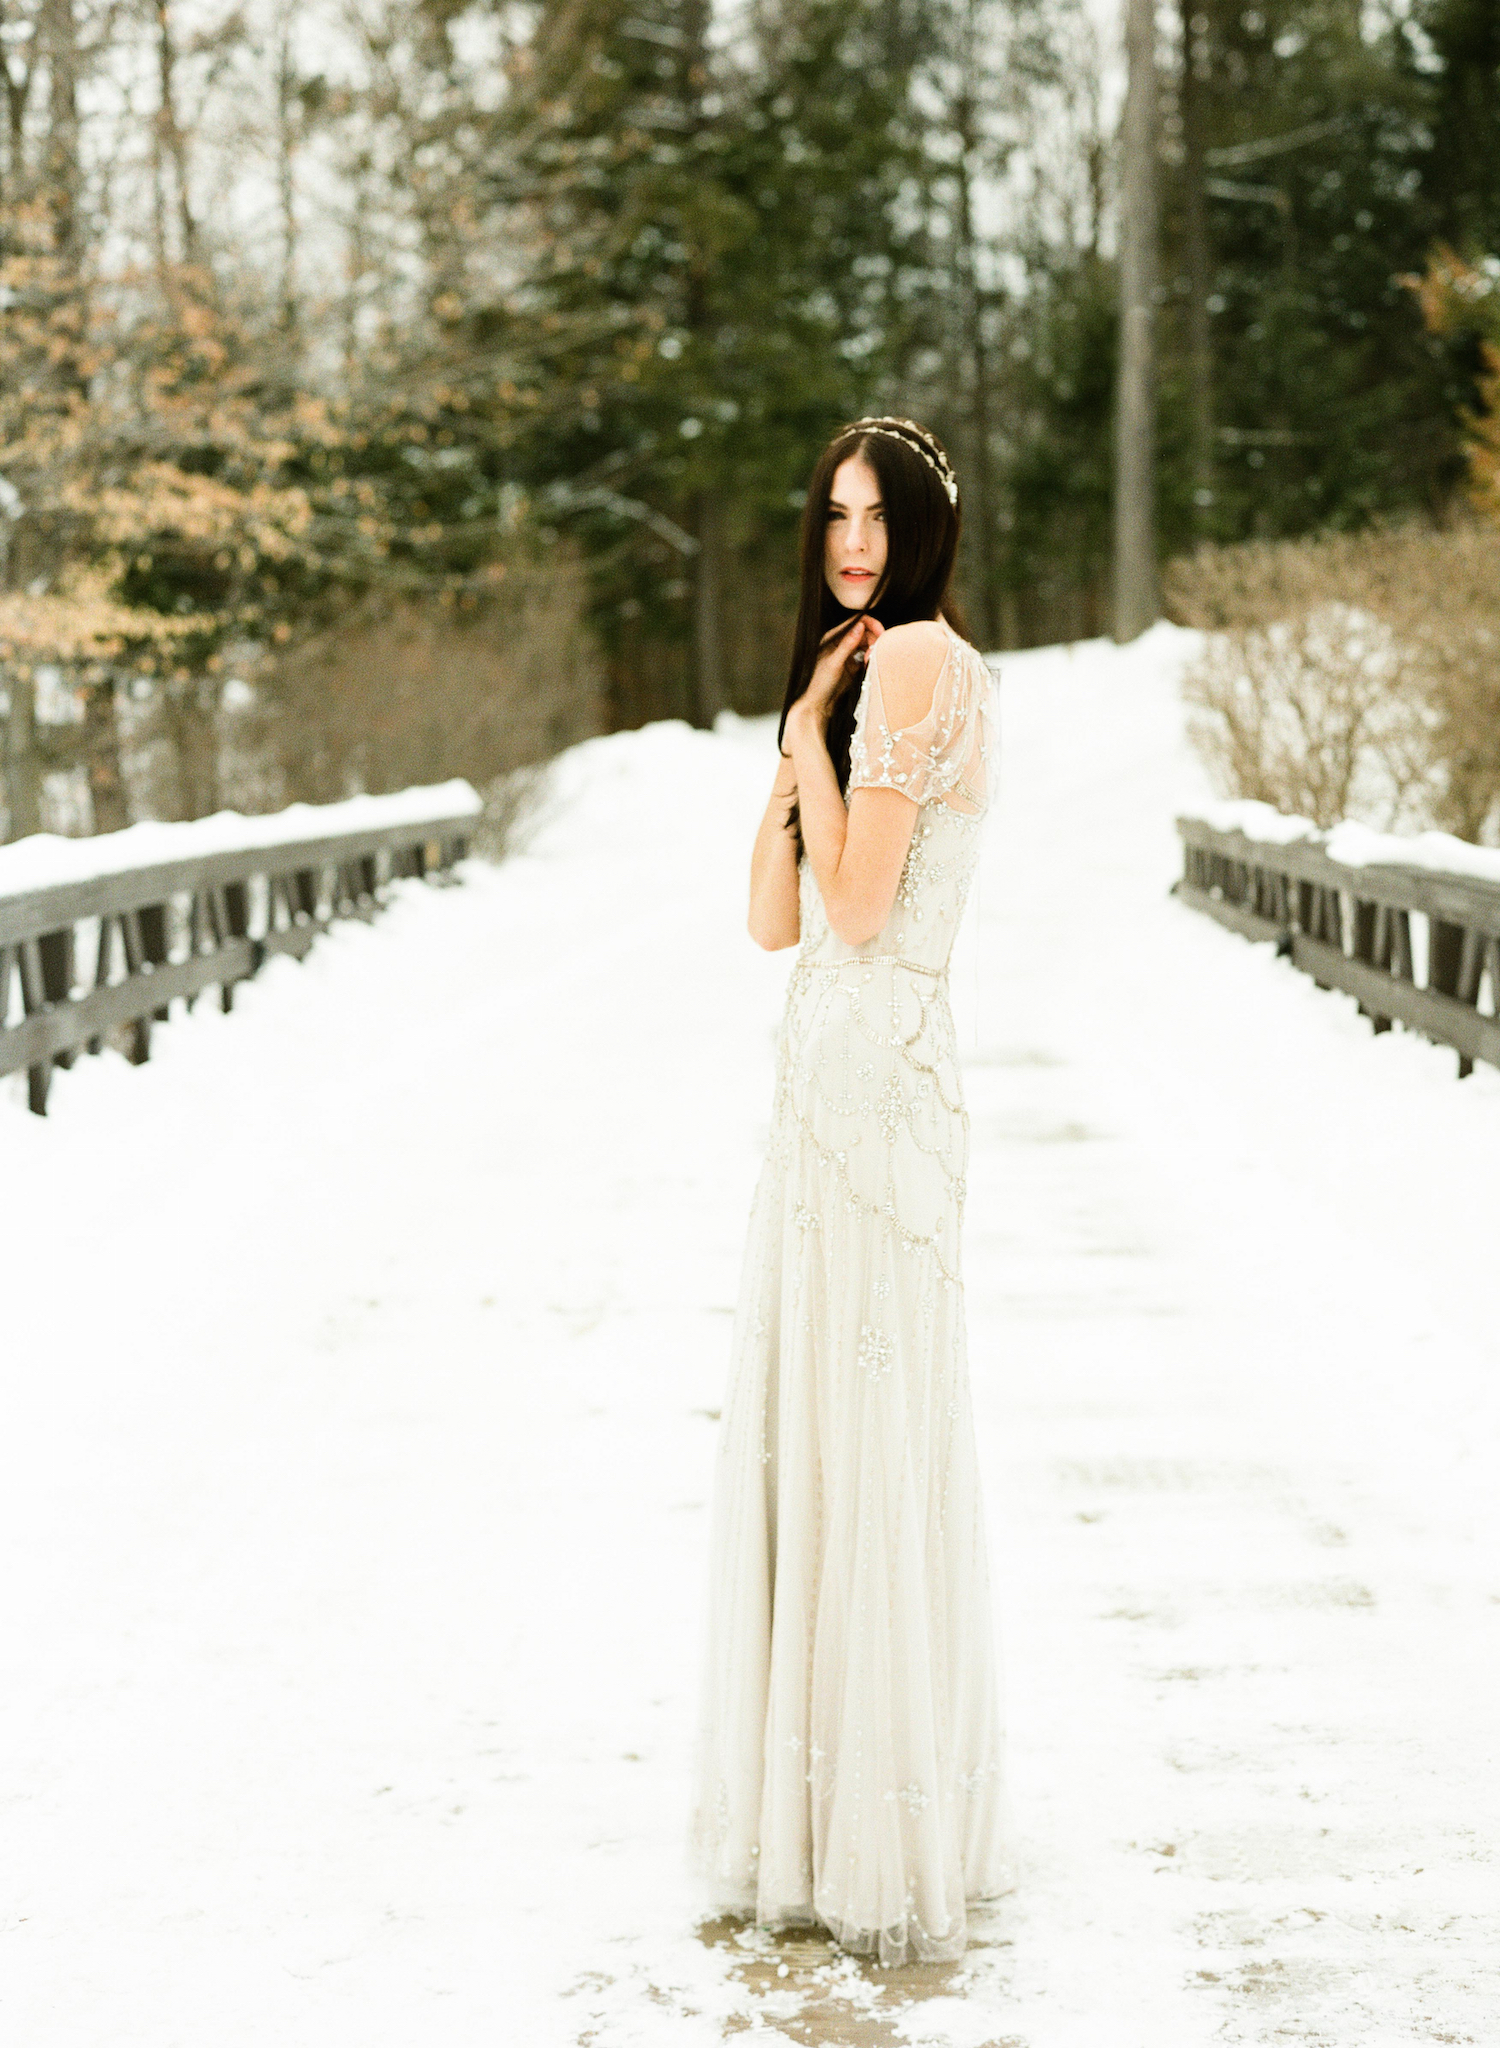 Winter Editorial-JennyPackham-LindsayMaddenPhotography-31 copy.jpg